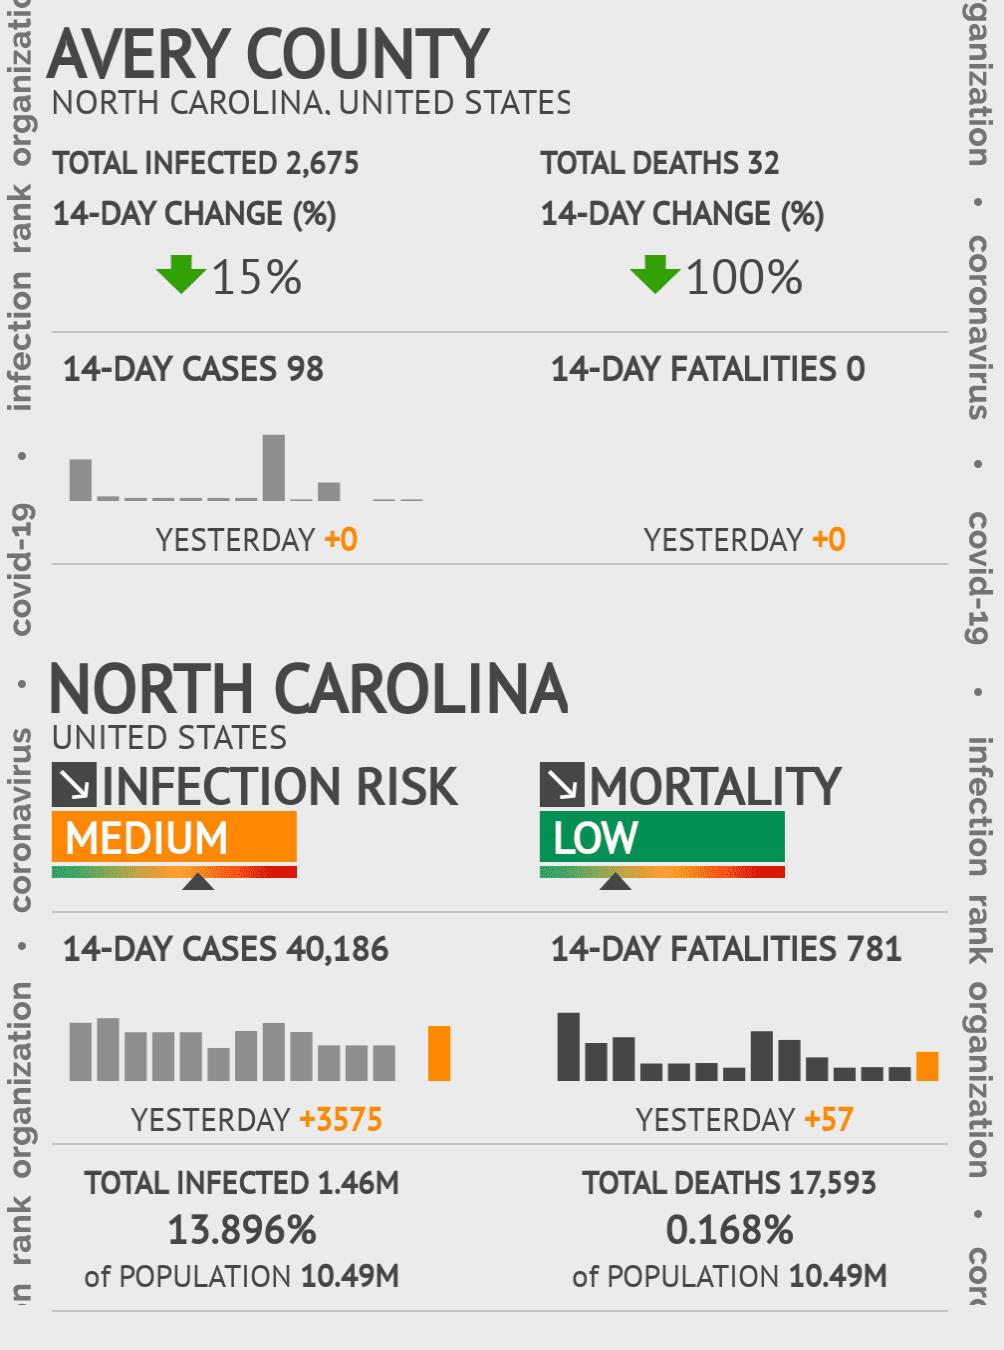 Avery County Coronavirus Covid-19 Risk of Infection on February 28, 2021